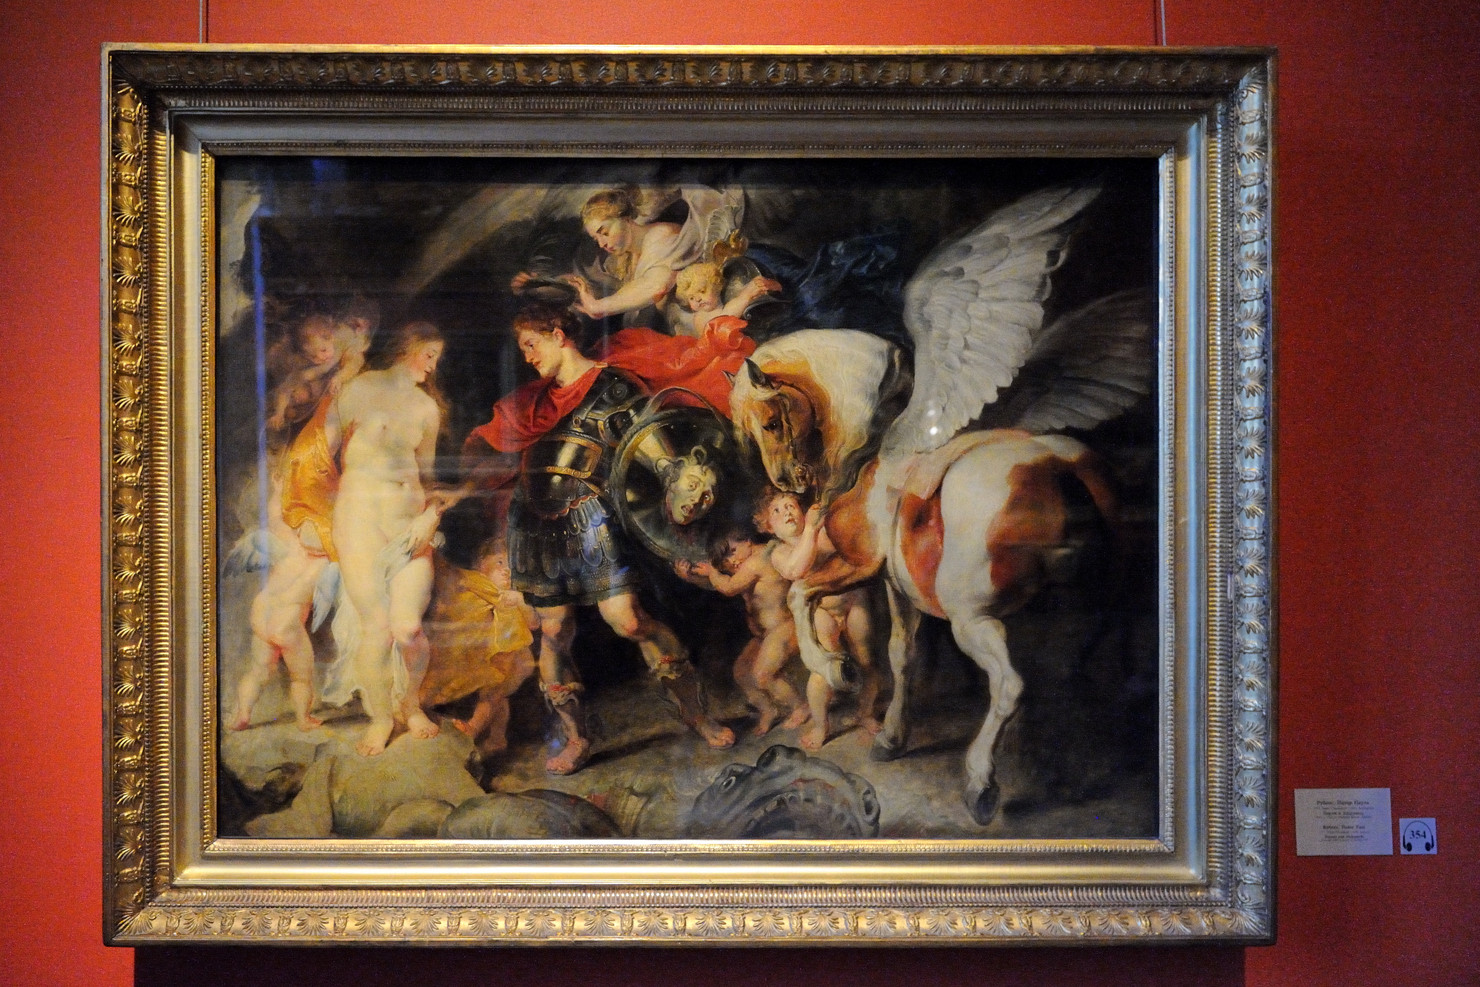 Рубенс Питер Пауль. (1577-1640) Персей и Андромеда.